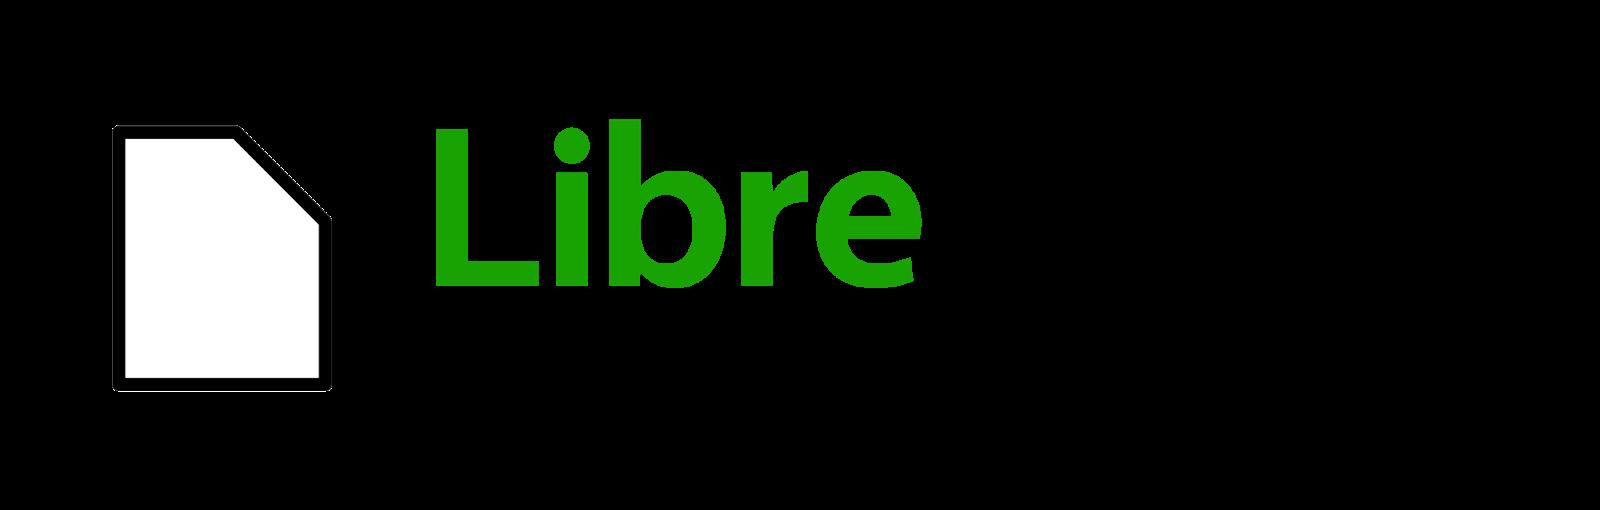 telecharger libreoffice writer gratuit